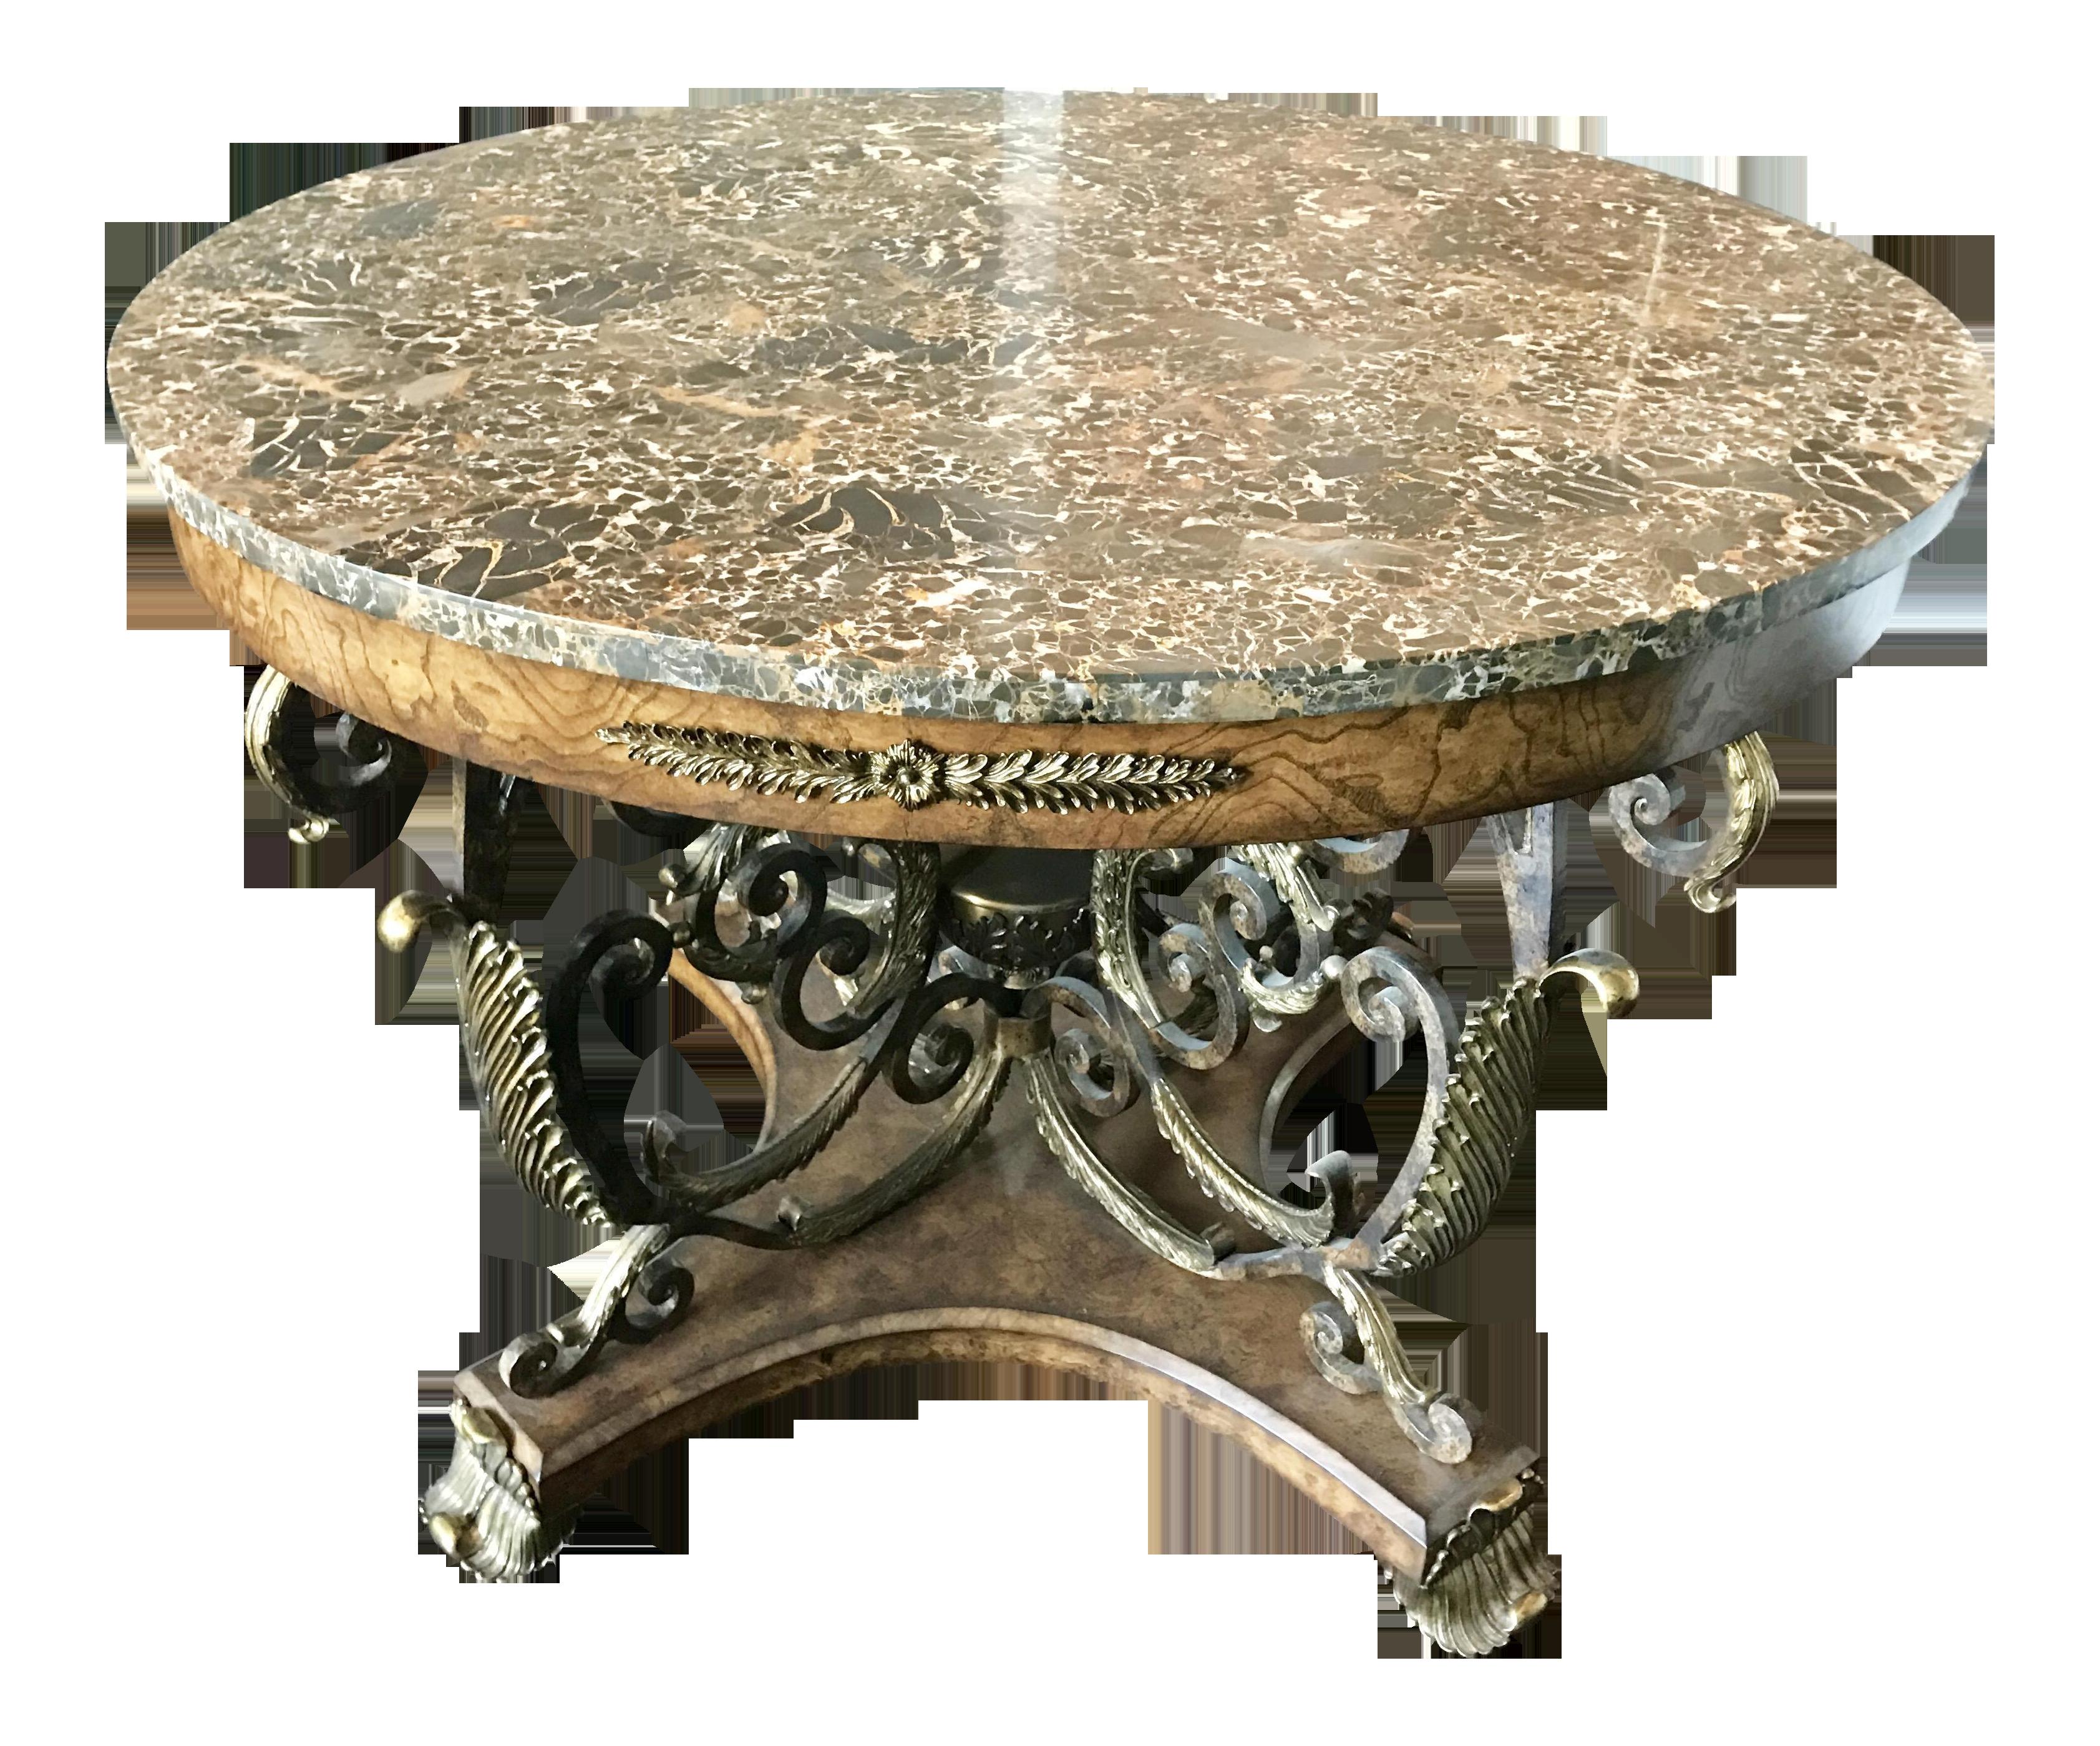 Maitland smith center table chairish for Table 52 art smith